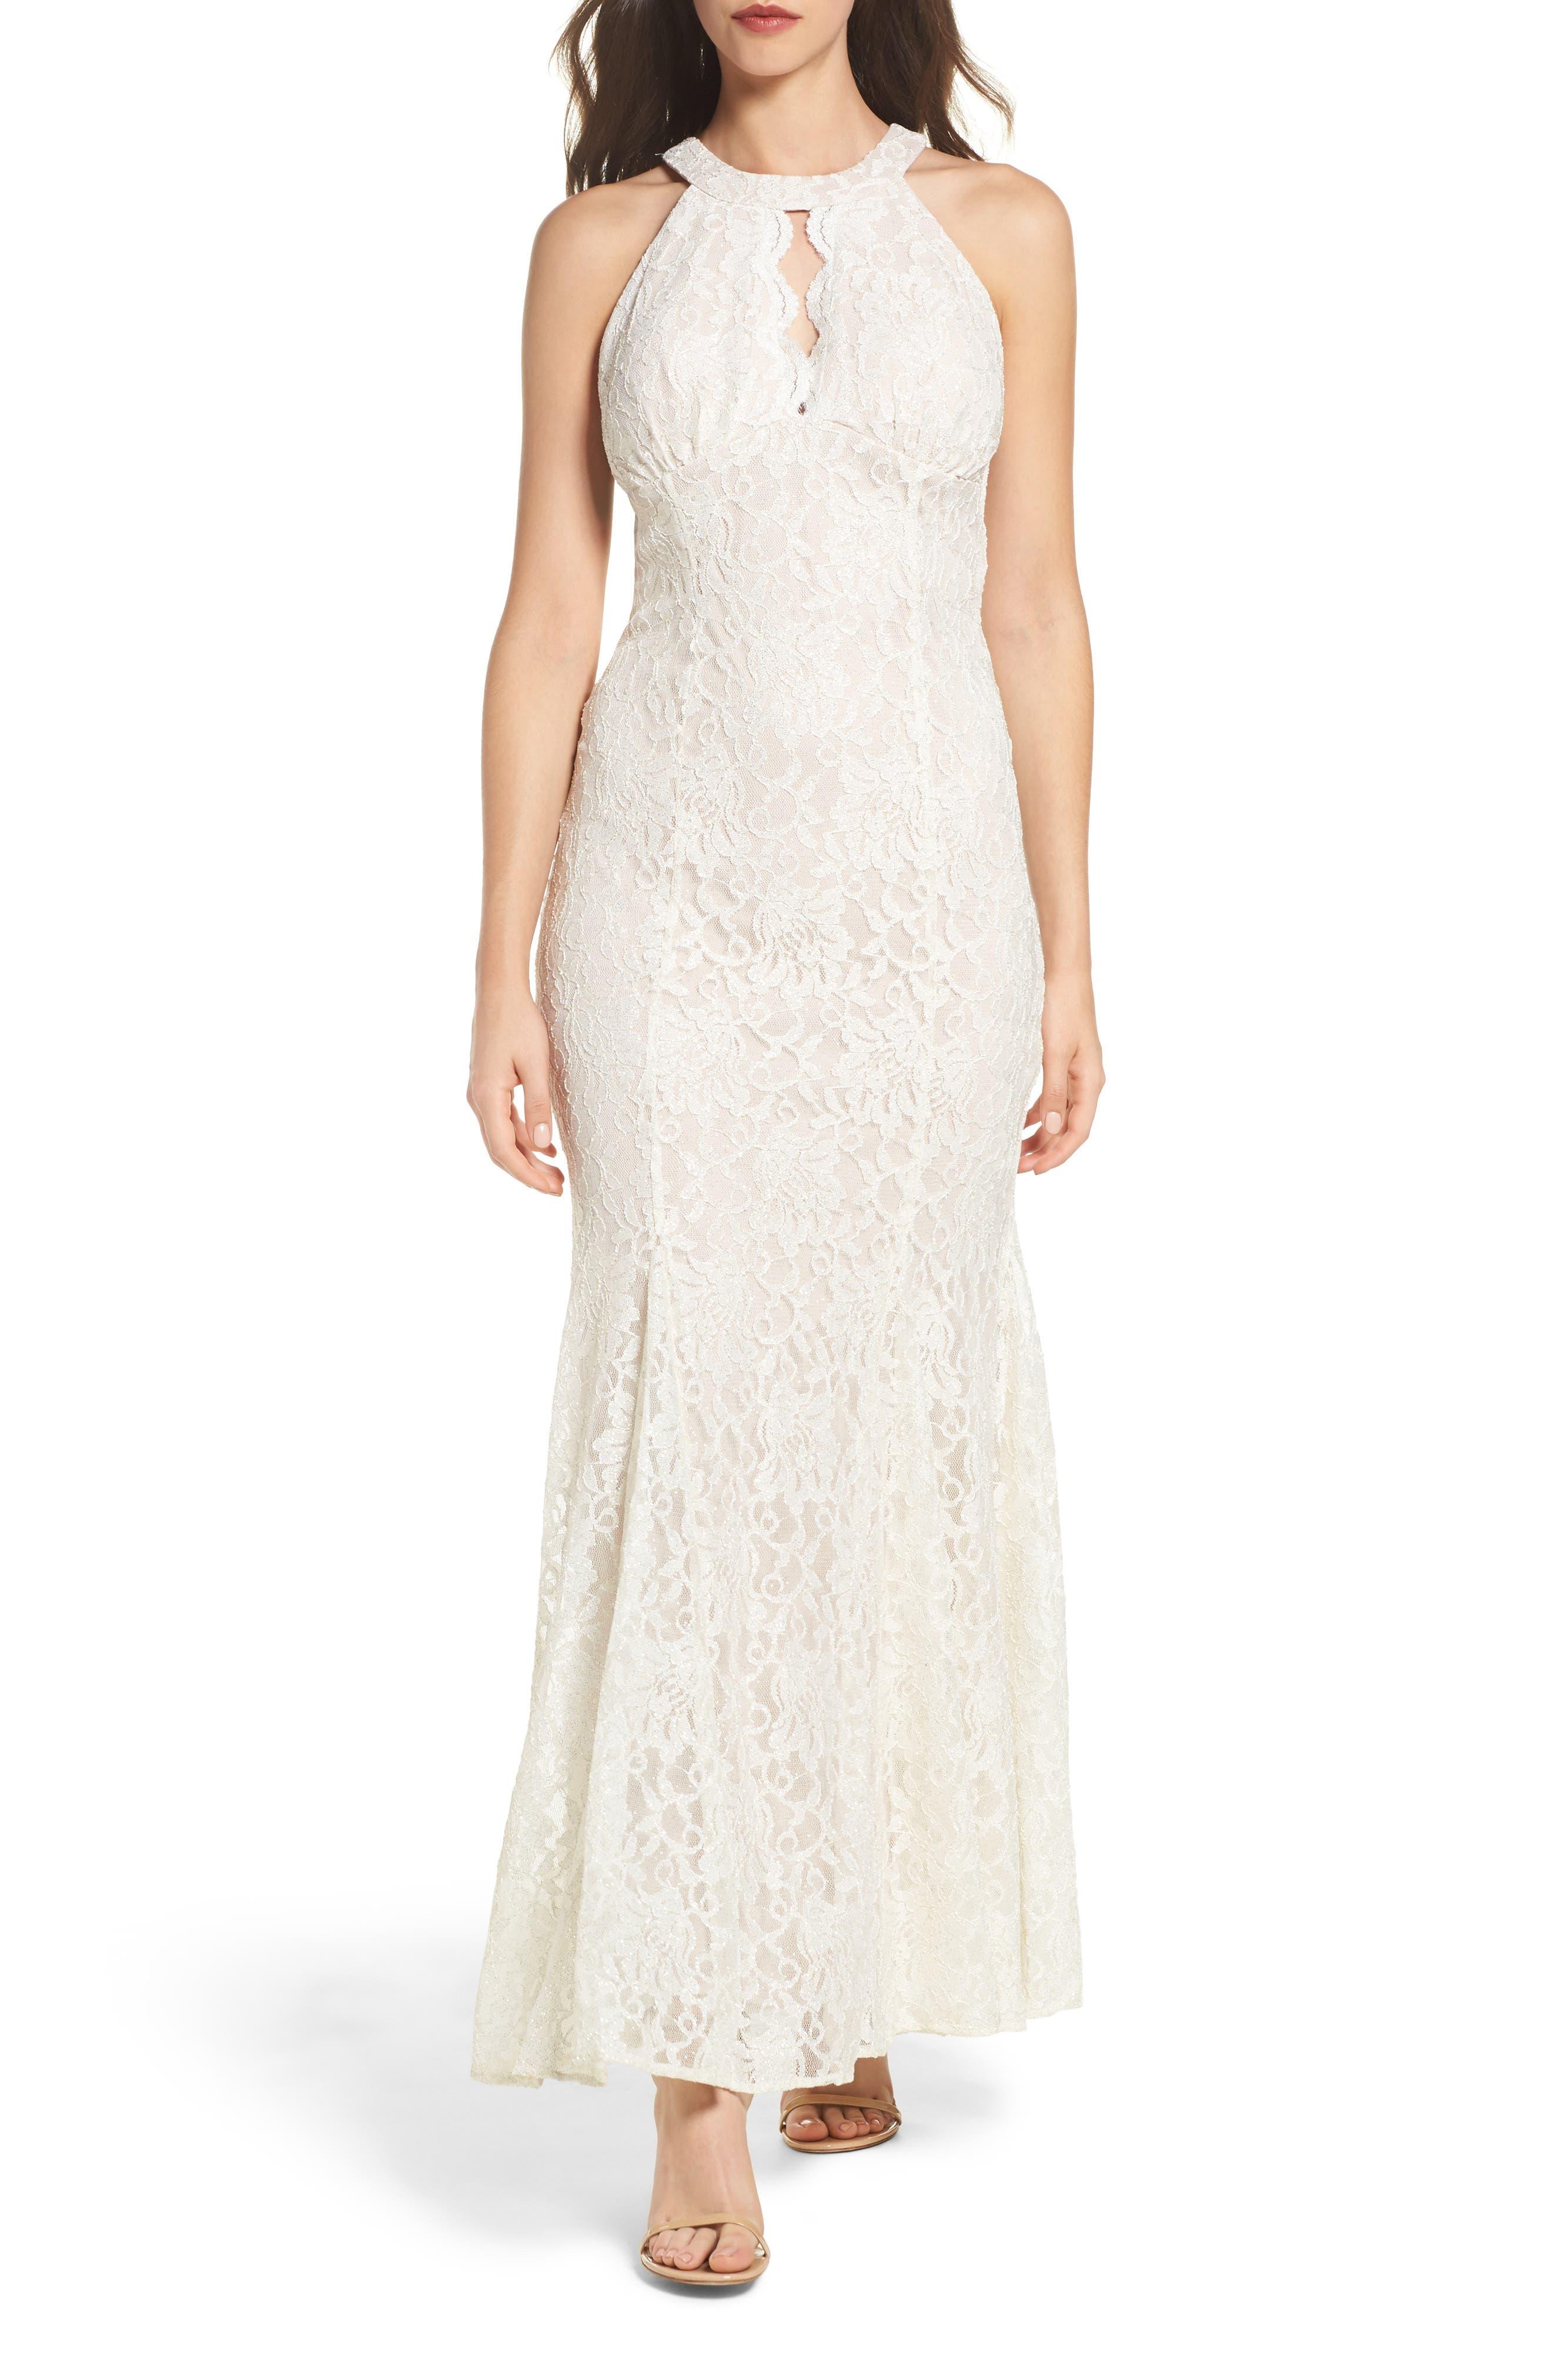 Scallop Detail Lace Gown,                         Main,                         color, 902